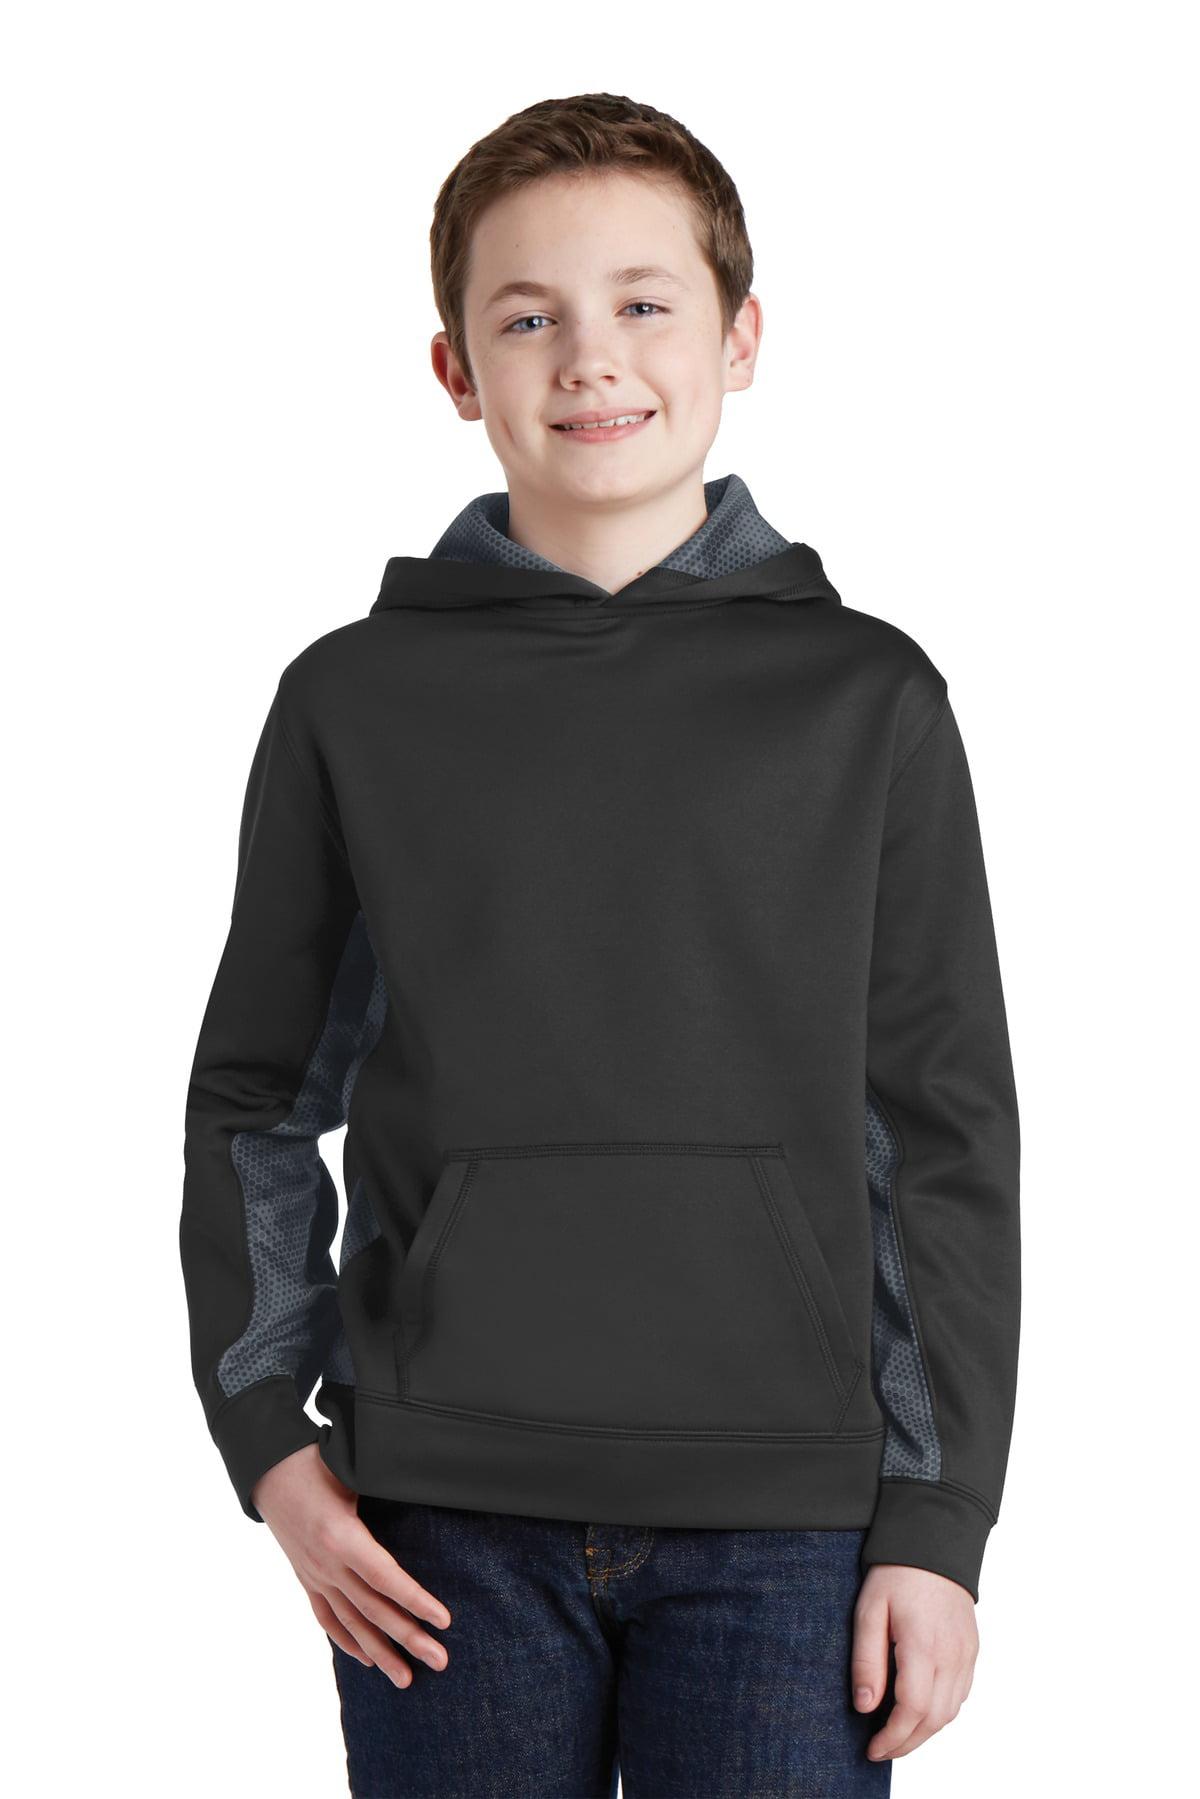 SportWick CamoHex Fleece Colorblock Hooded Pullover